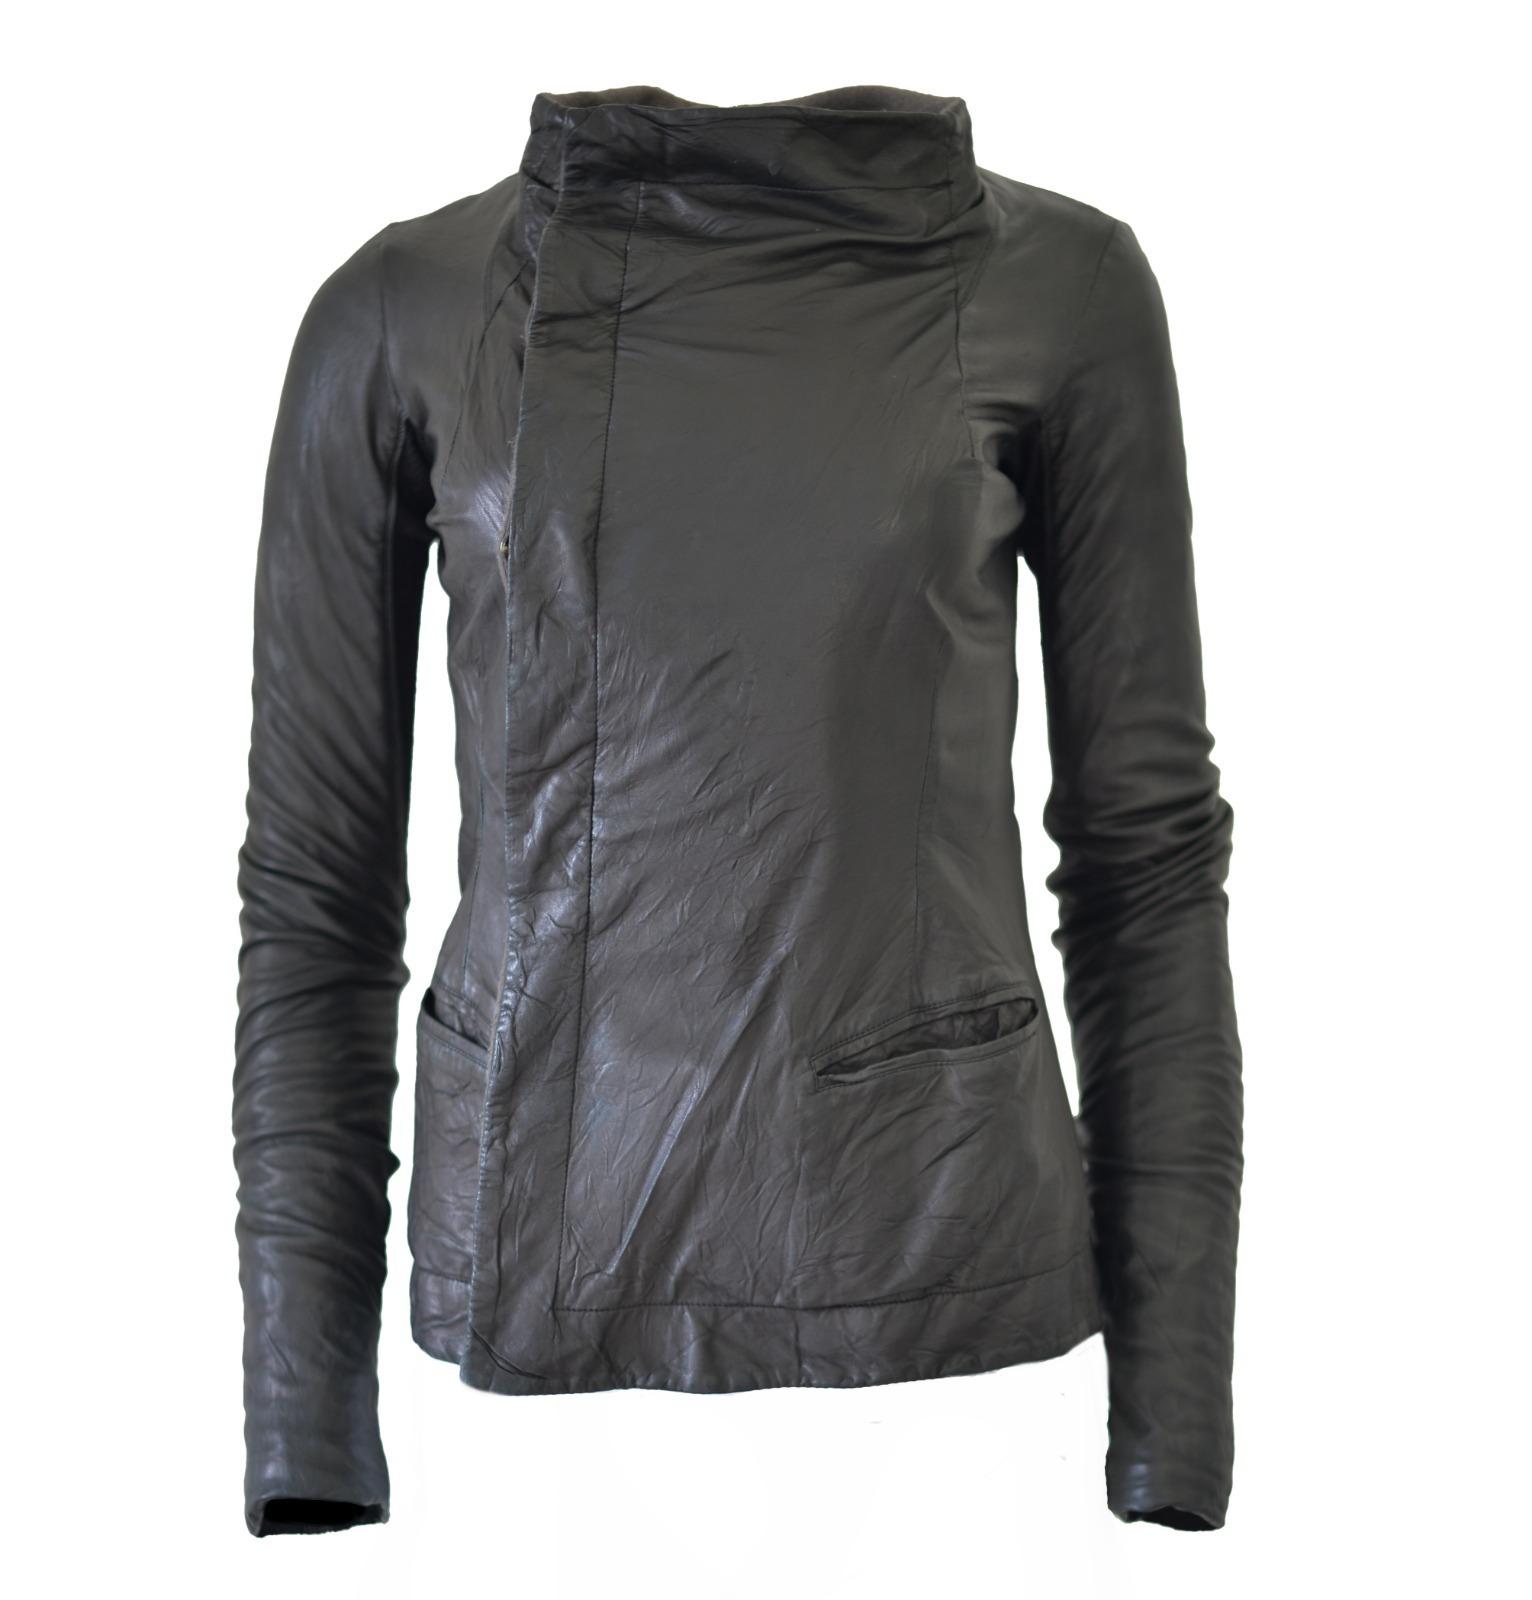 Buy: Black Leather Asymmetrical Biker Jacket, Size 8